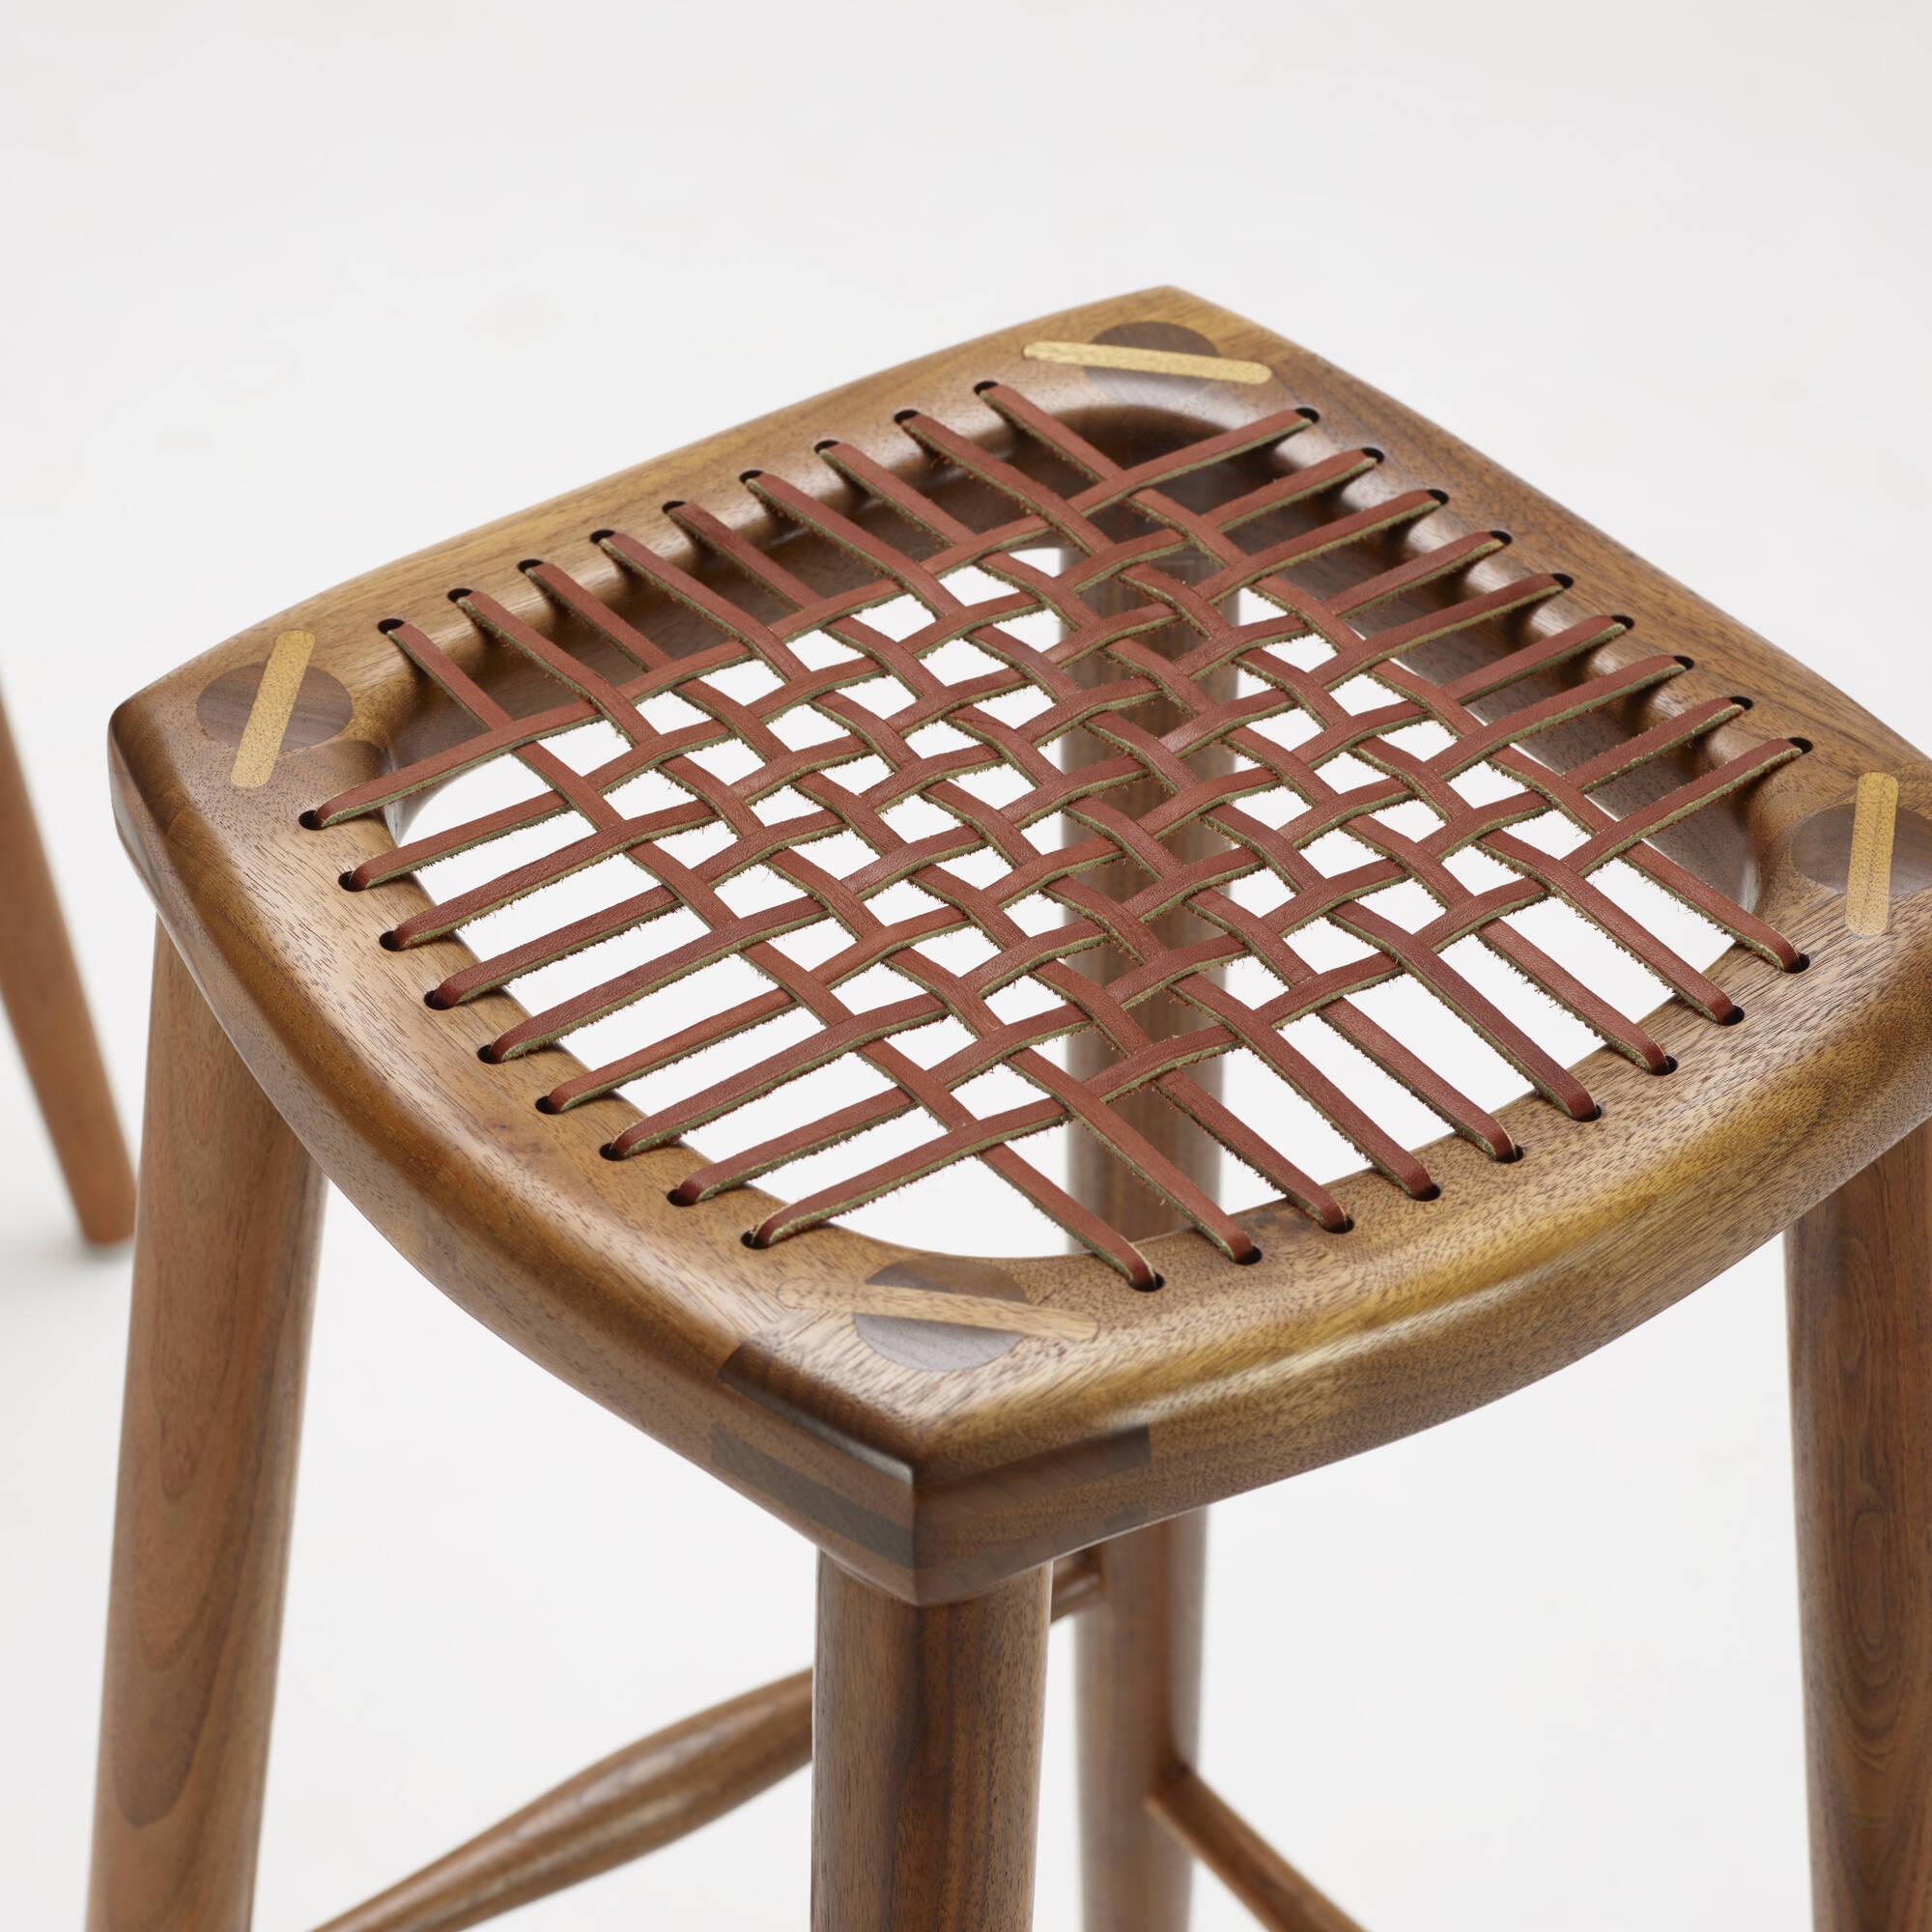 179: Sam Maloof / bar stools, set of three (3 of 4)